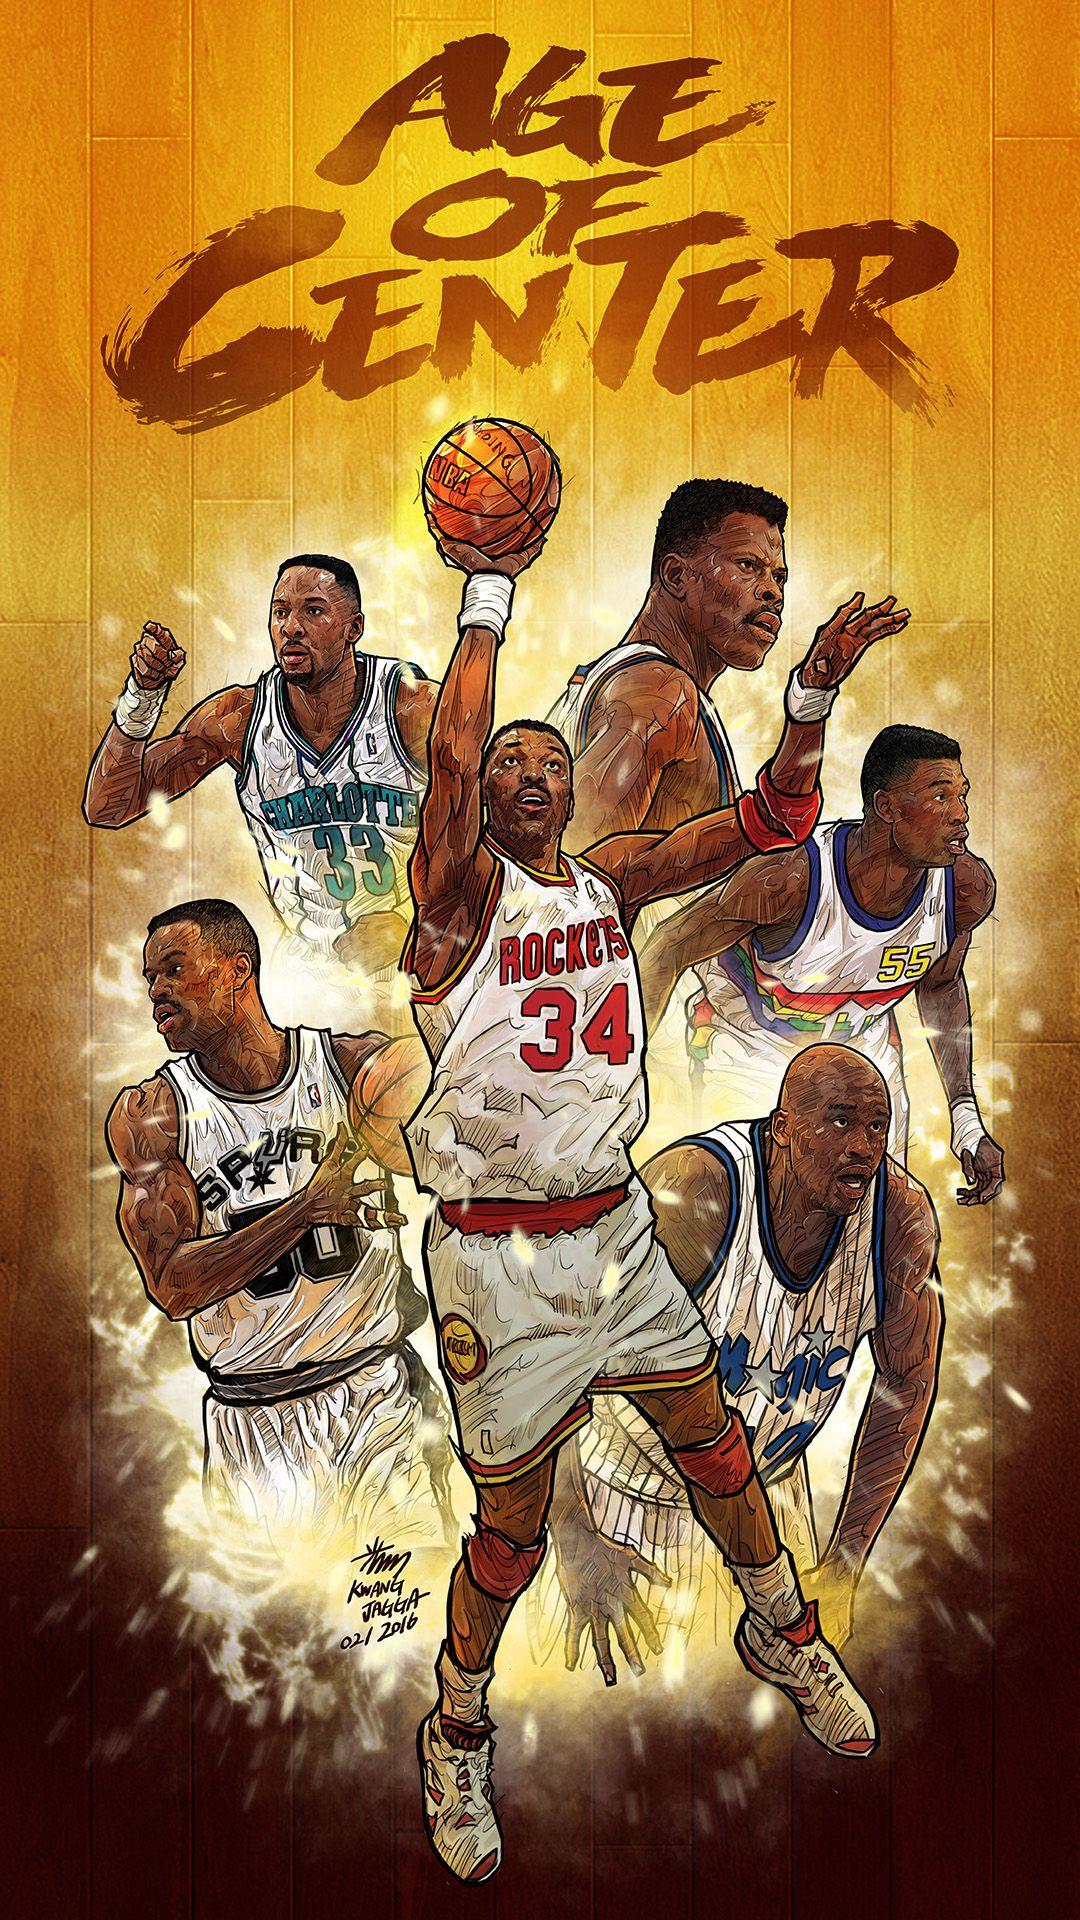 Smartphone Lock Screen Wallpaperkwang Jagga Illustration1080 X 1920 9 16apple I Phone 5 6 6s 6 6s Samsung G Nba Basketball Art Basketball Art Nba Art